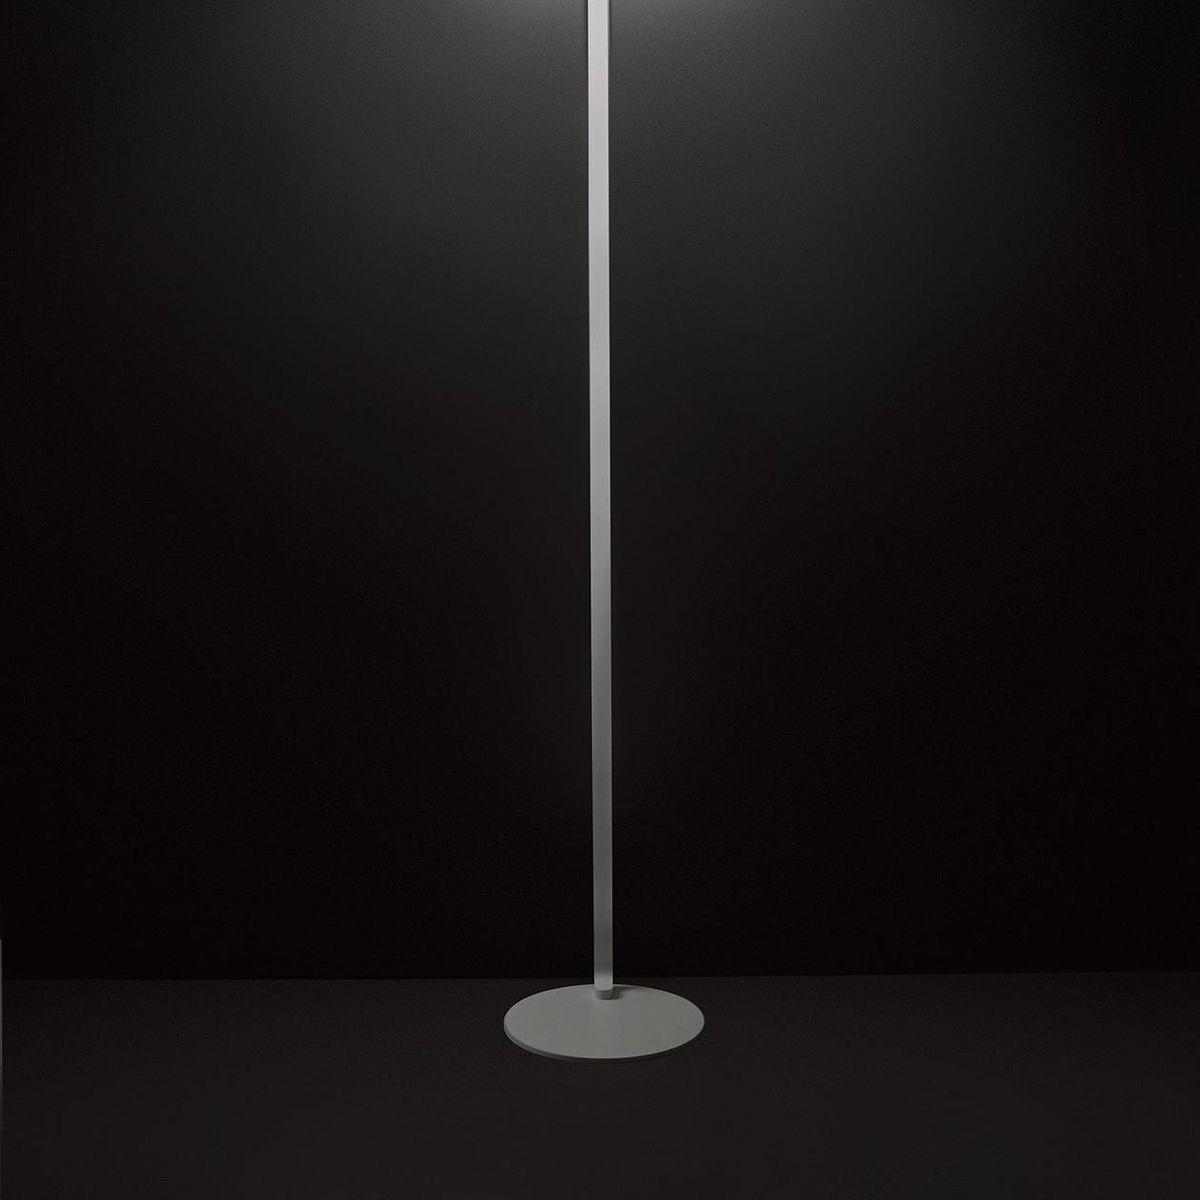 sestessa terra lampadaire led cini nils. Black Bedroom Furniture Sets. Home Design Ideas